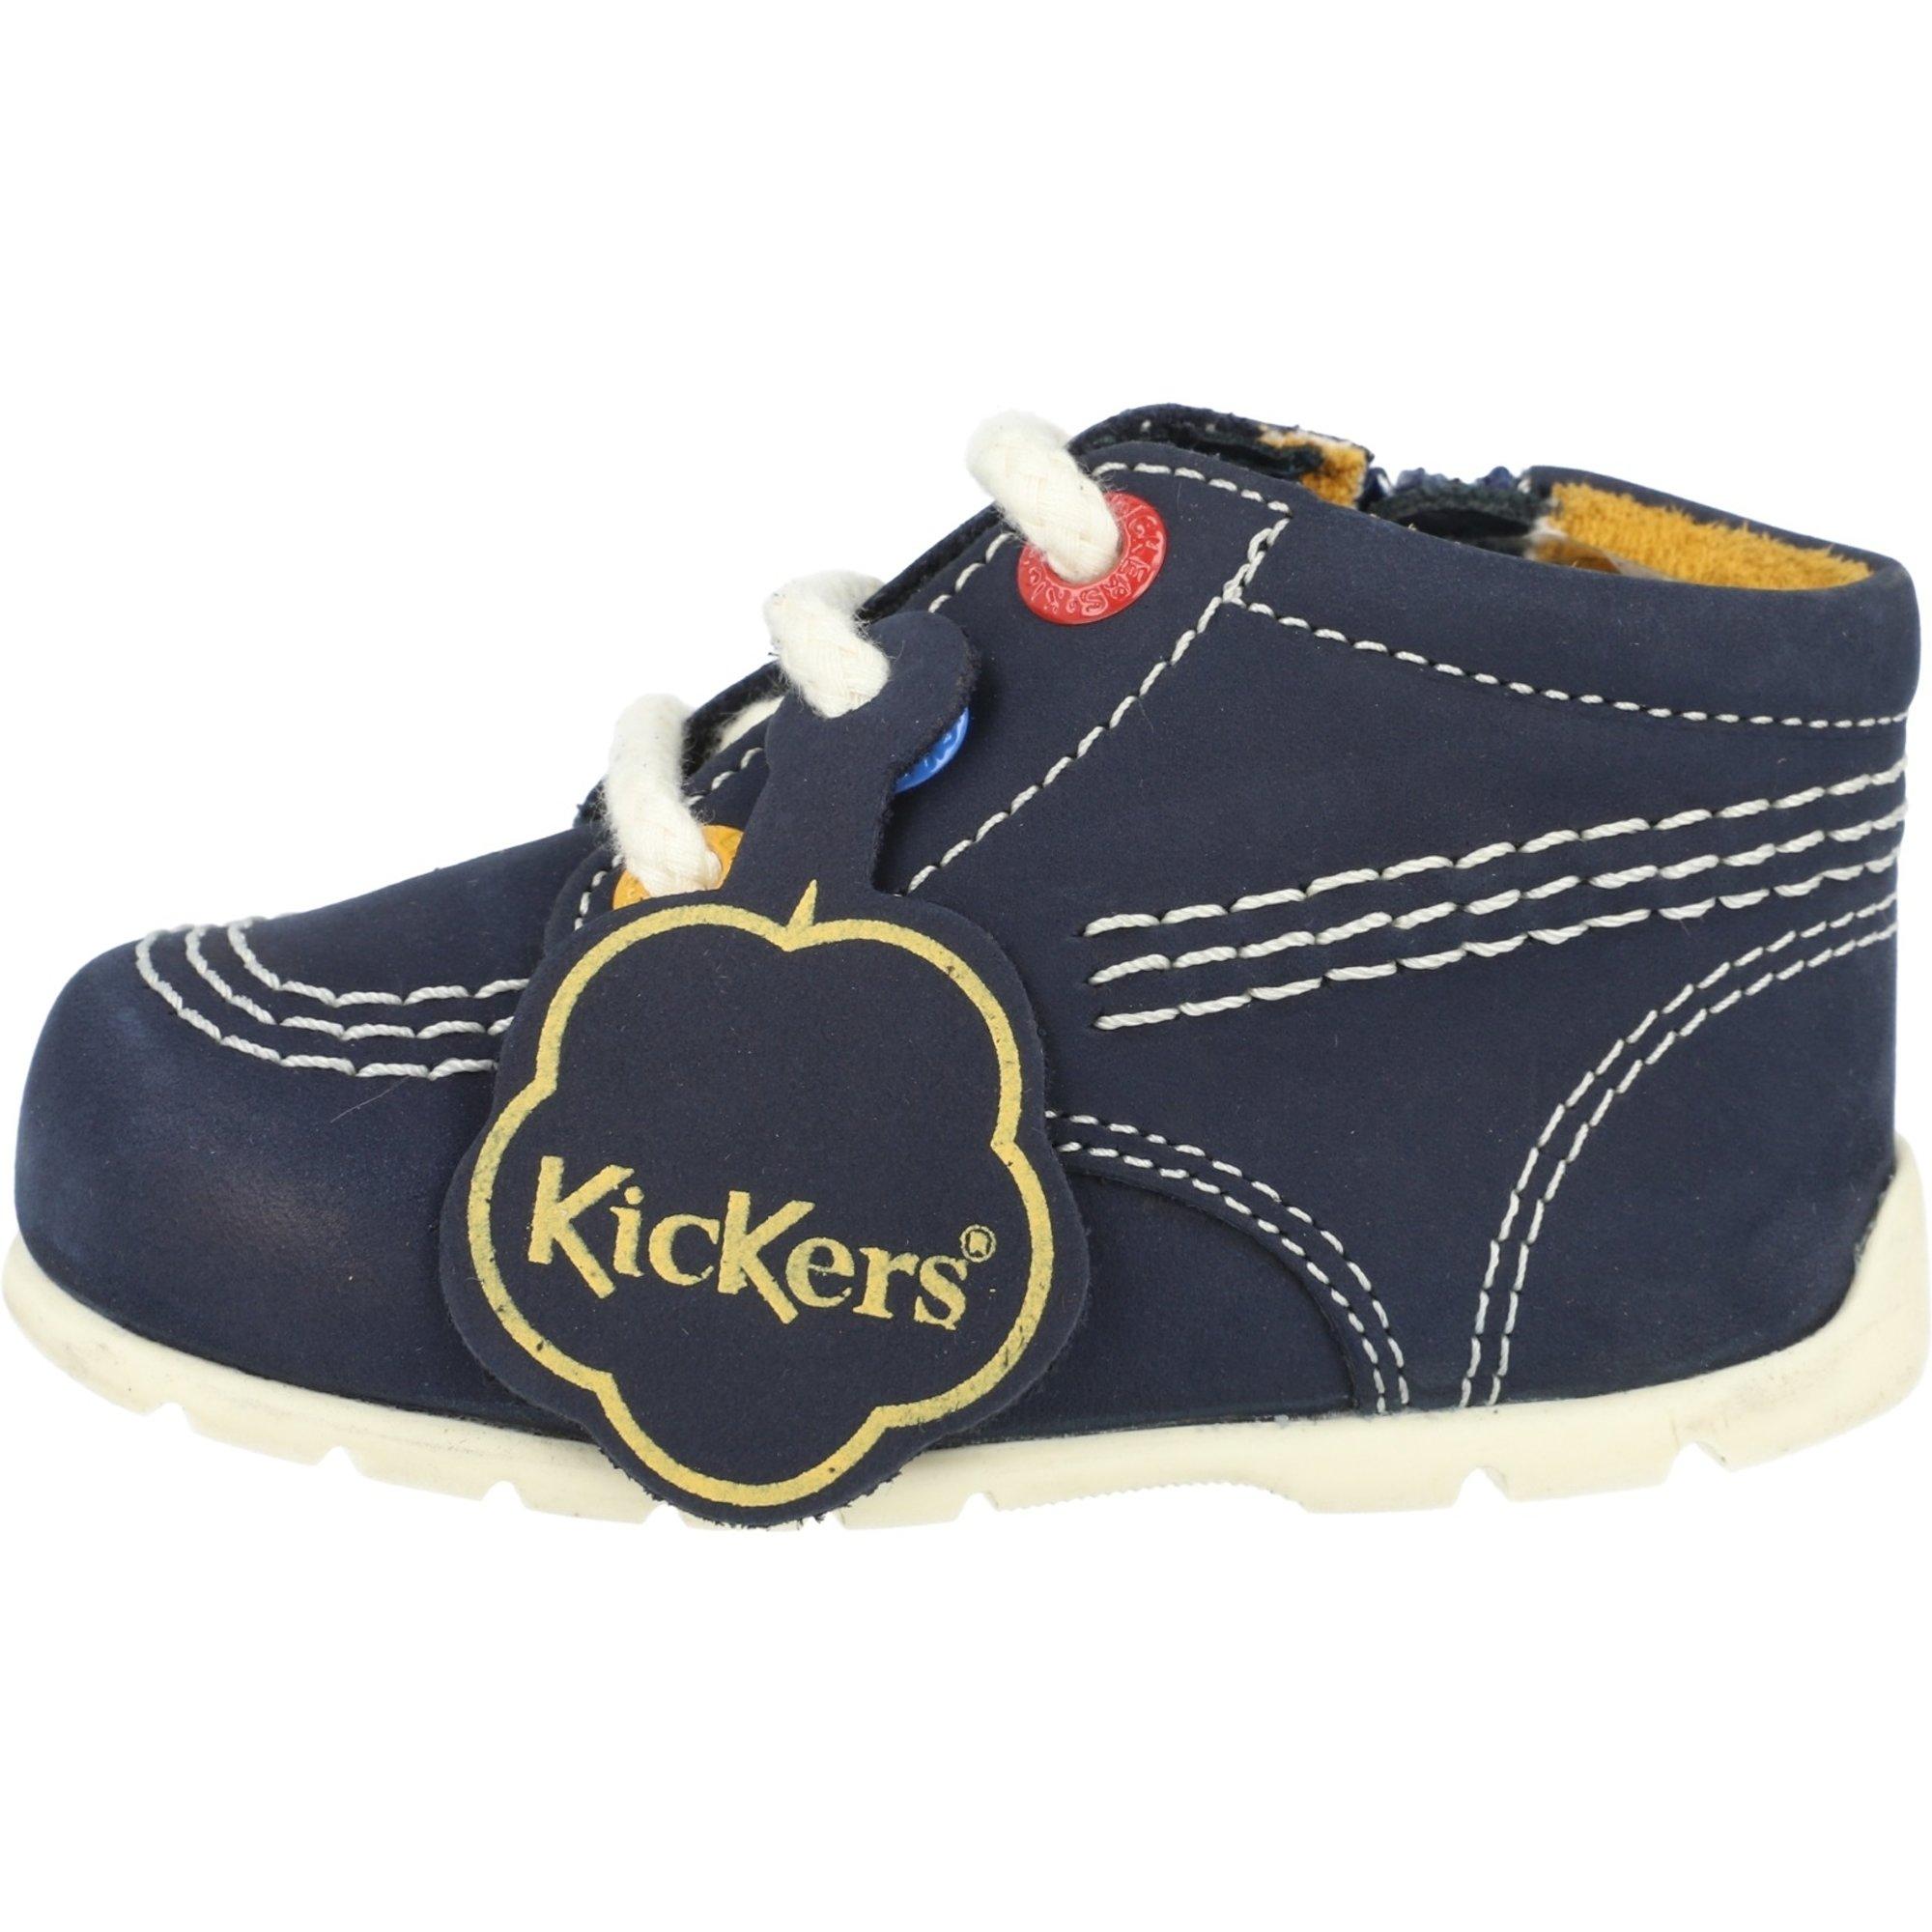 Kickers Kick Hi B Navy Nubuck